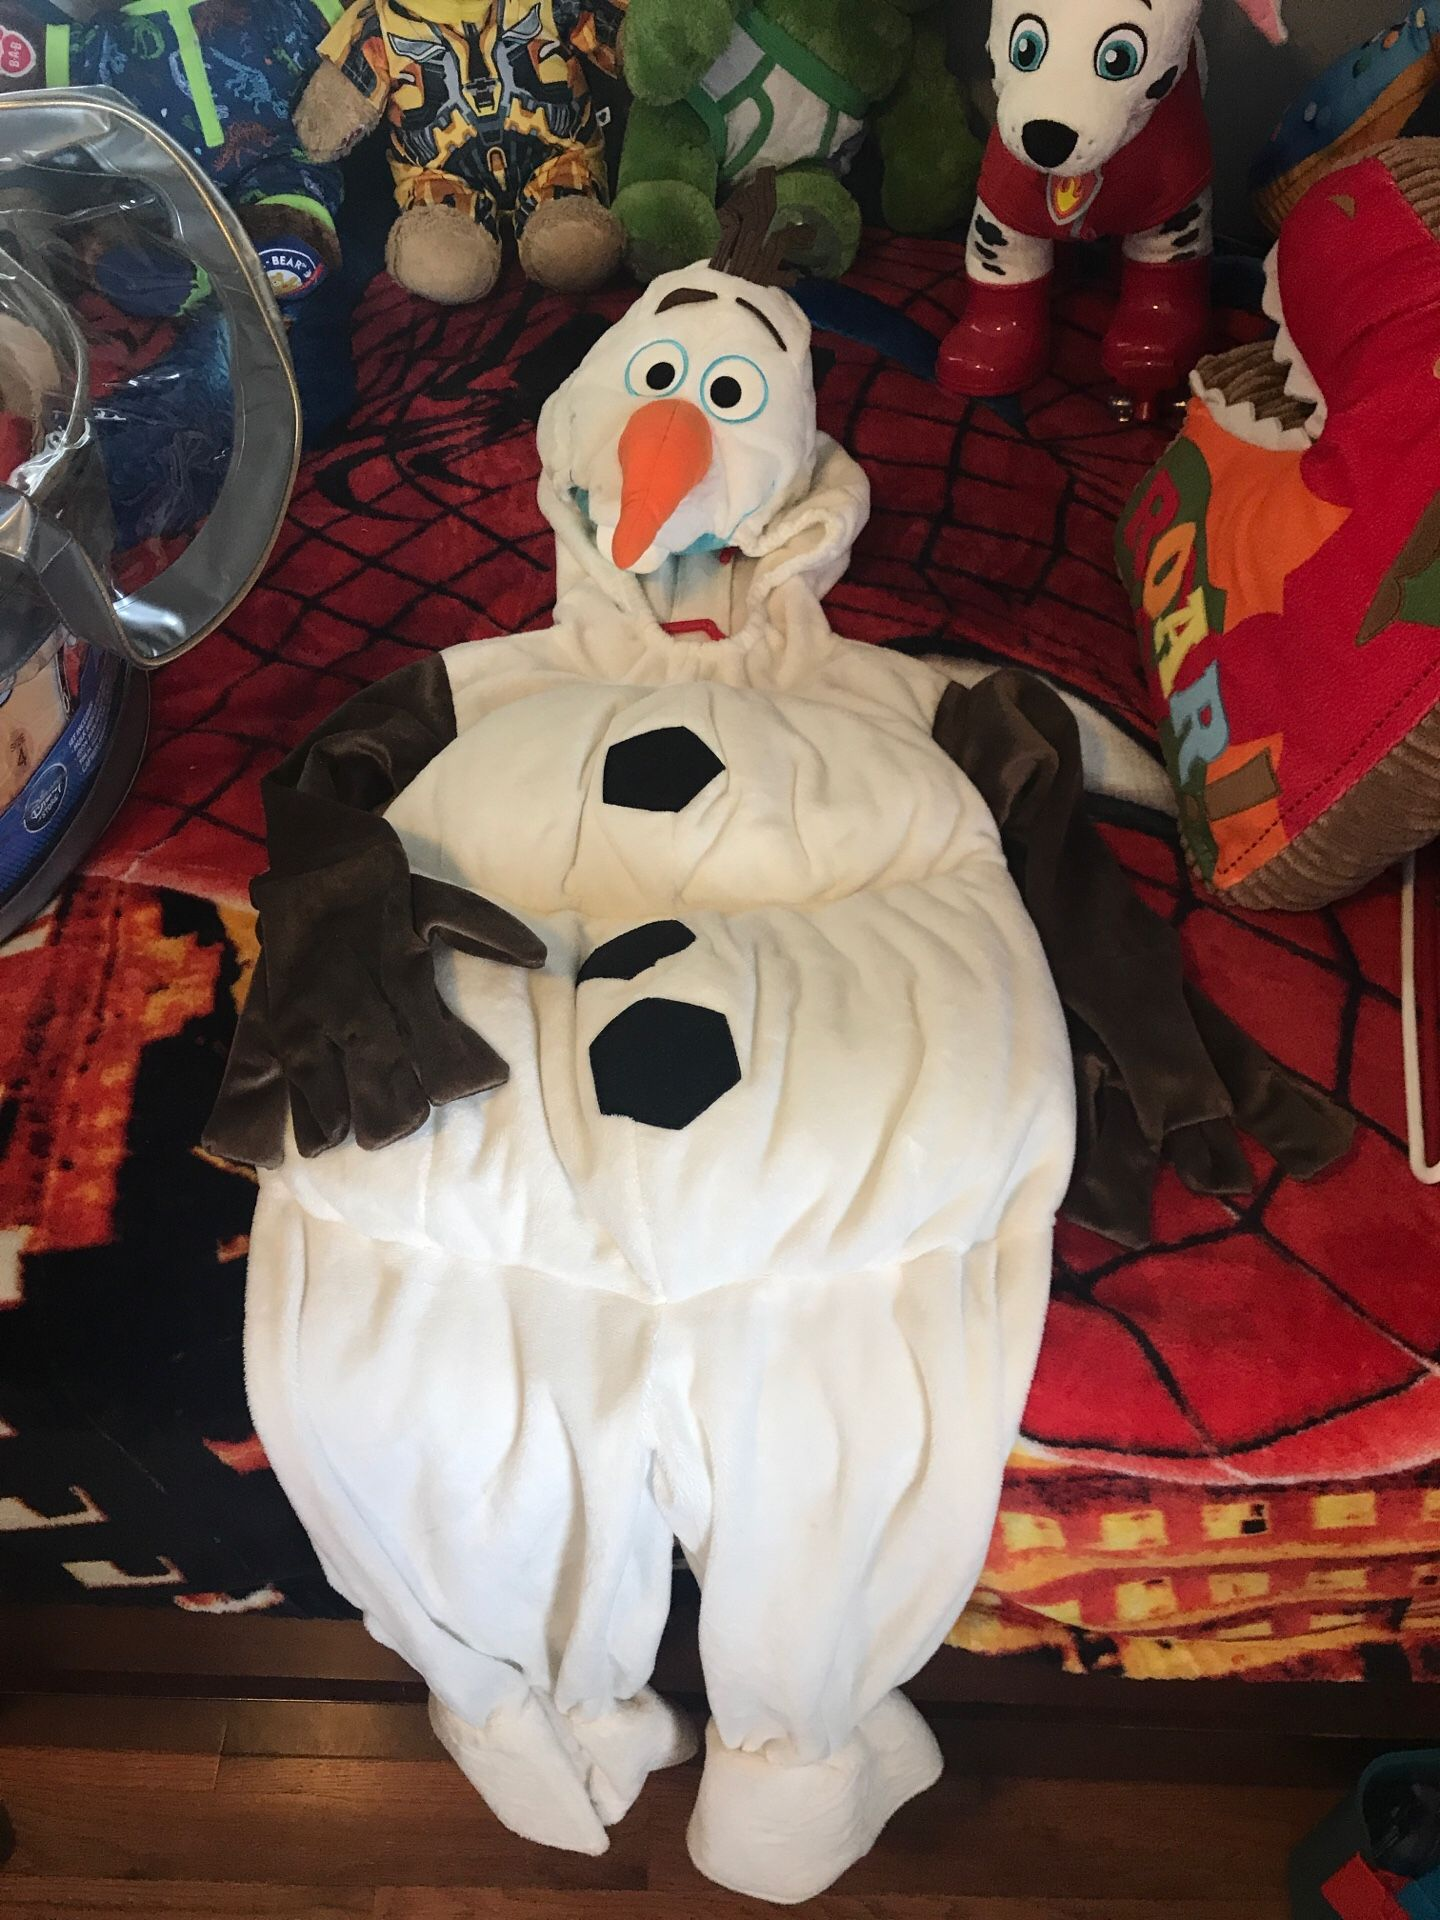 Disney store Olaf costume